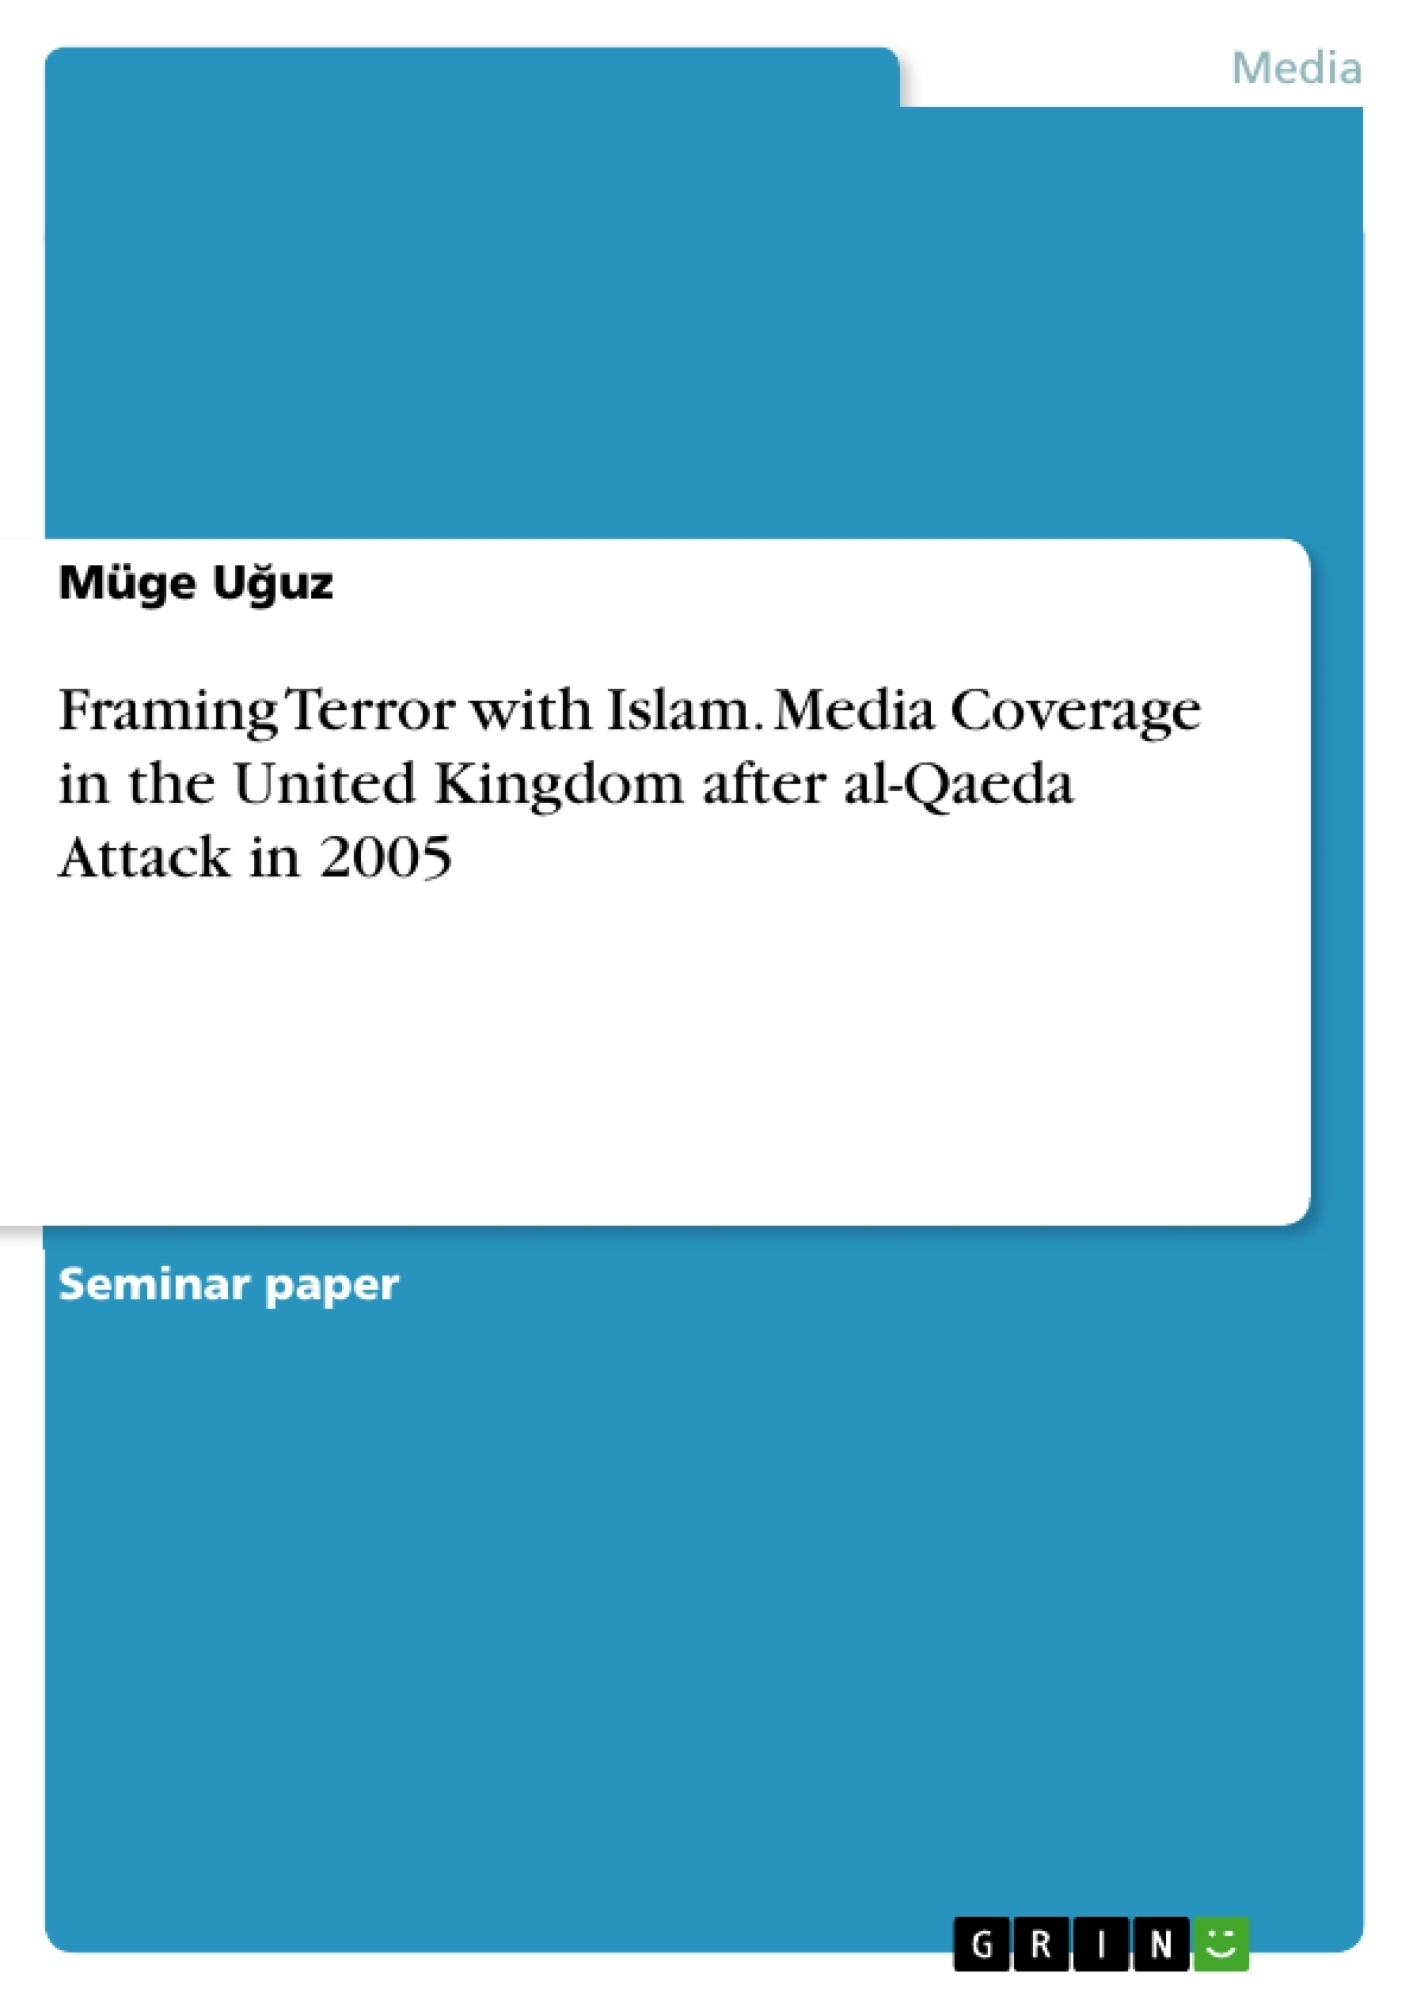 Title: Framing Terror with Islam. Media Coverage in the United Kingdom after al-Qaeda Attack in 2005